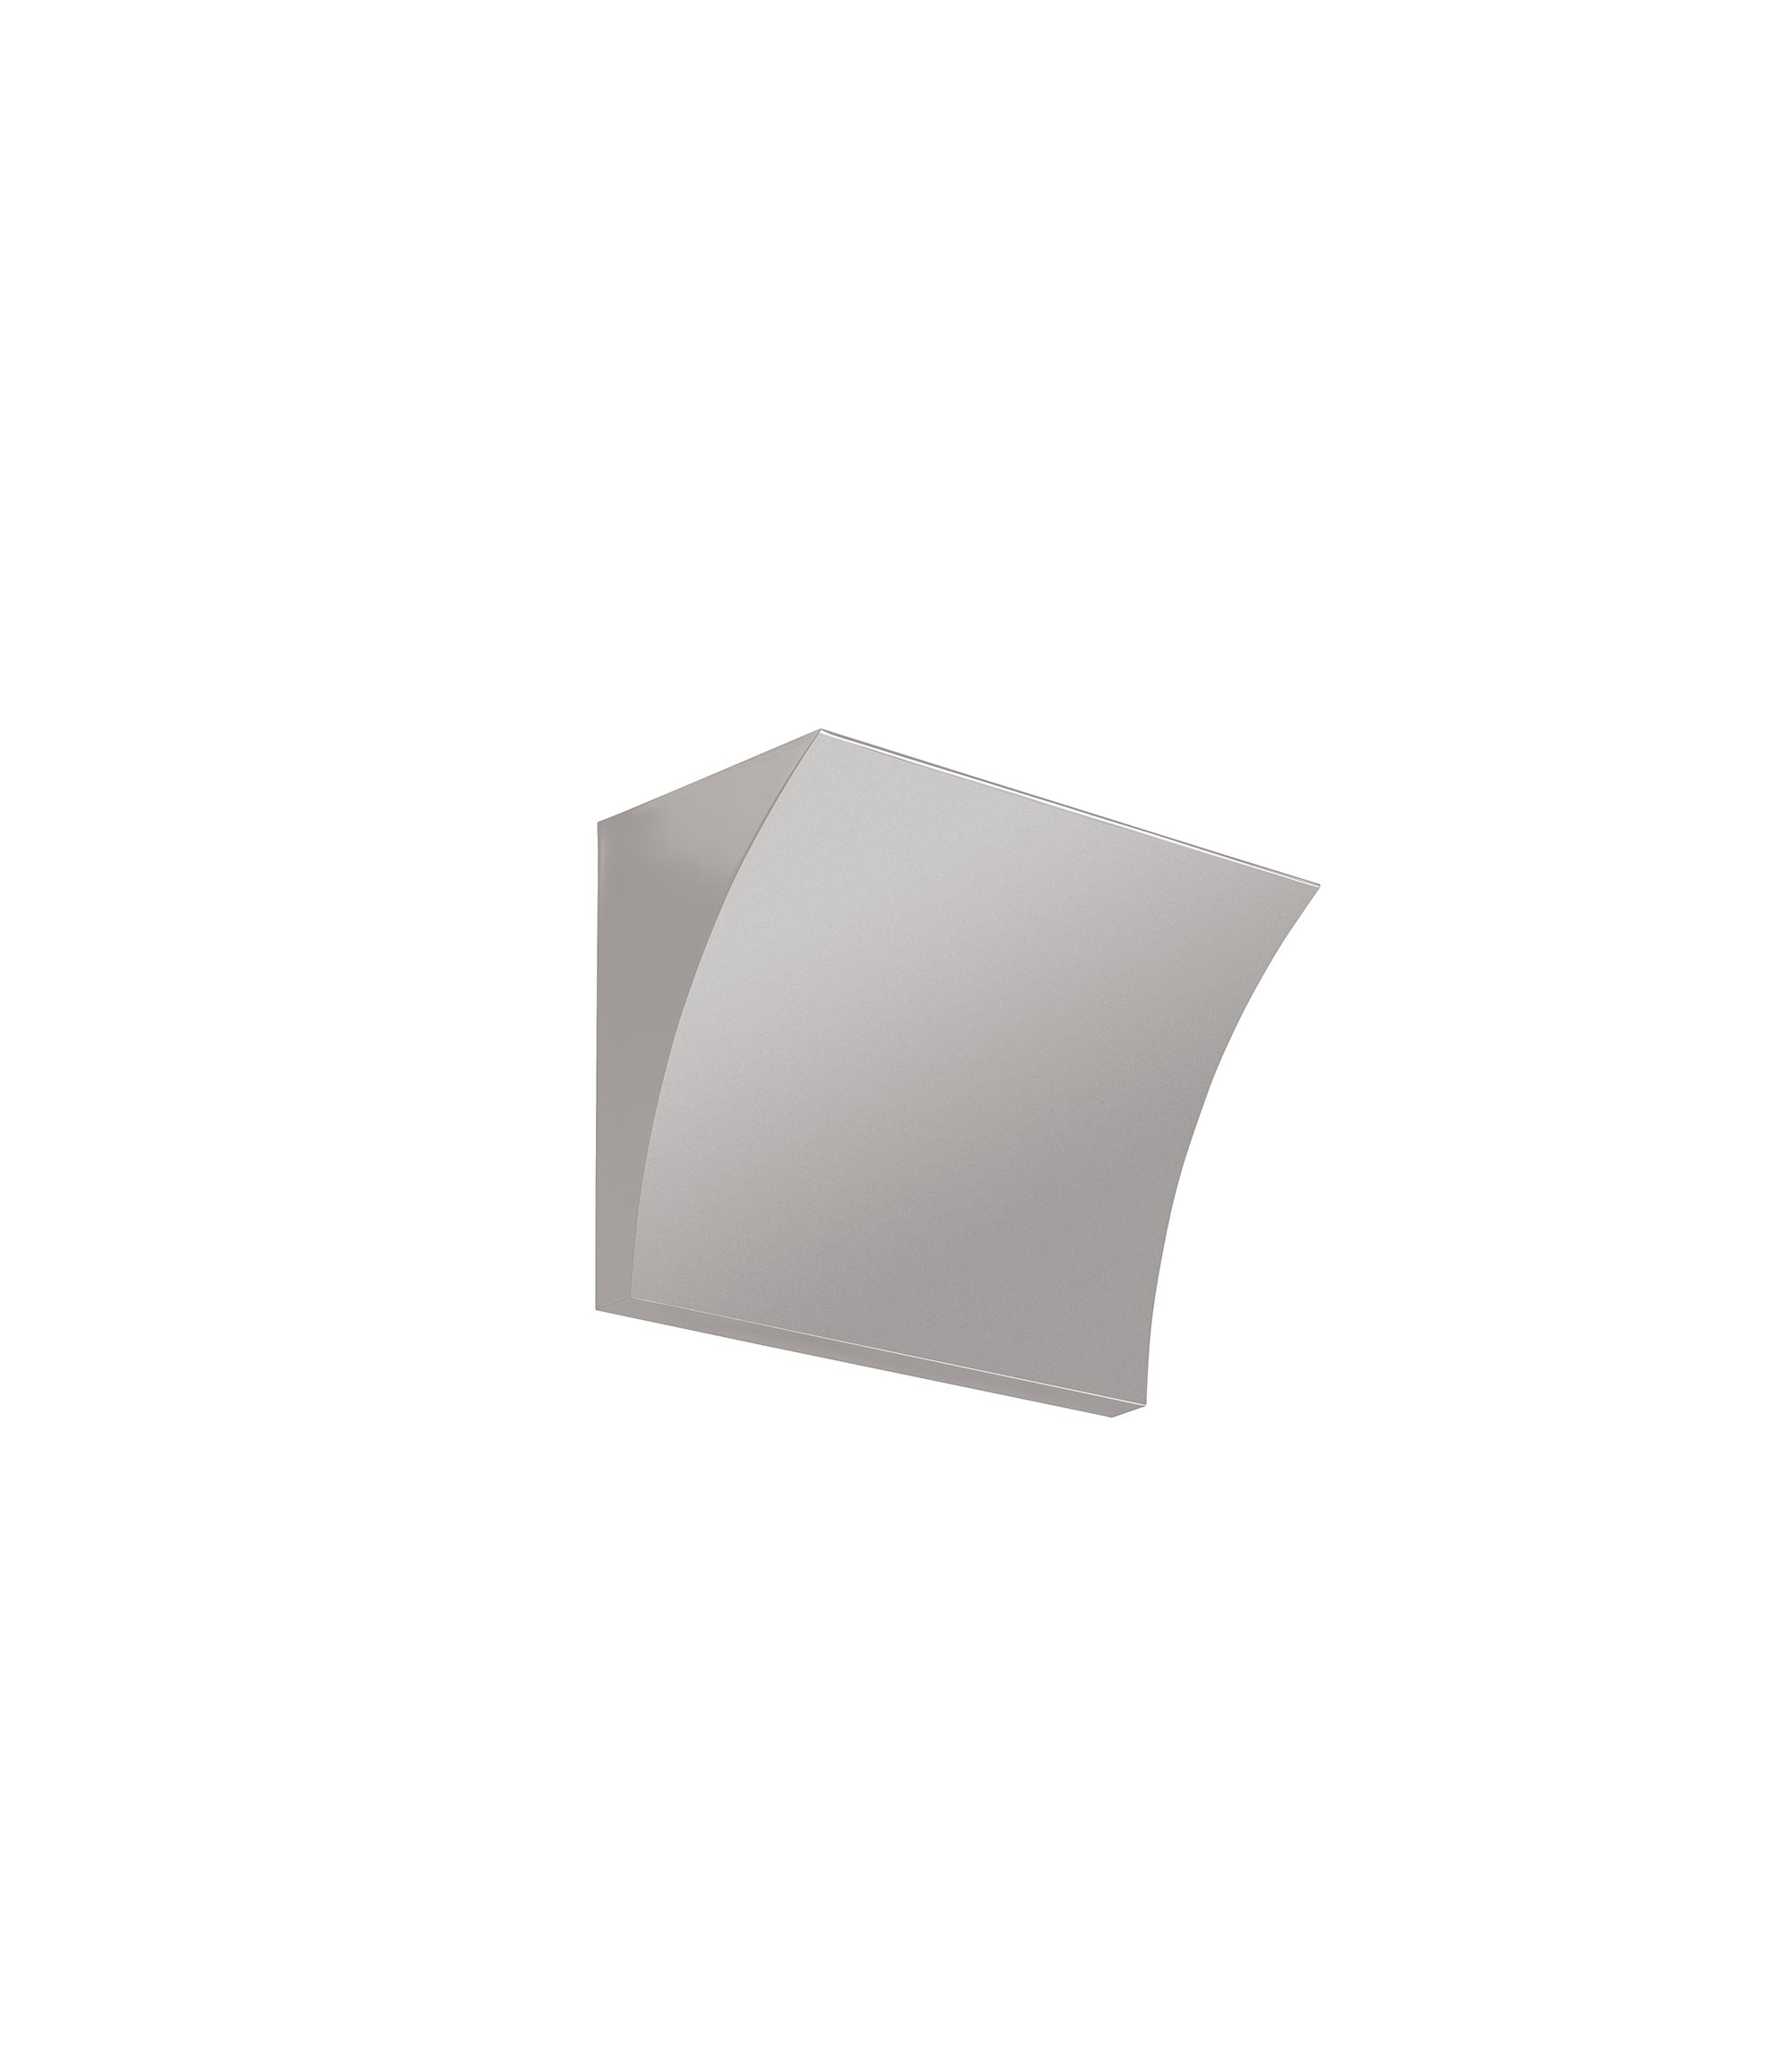 Pochette wall dordoni flos F9700020 product still life big 1